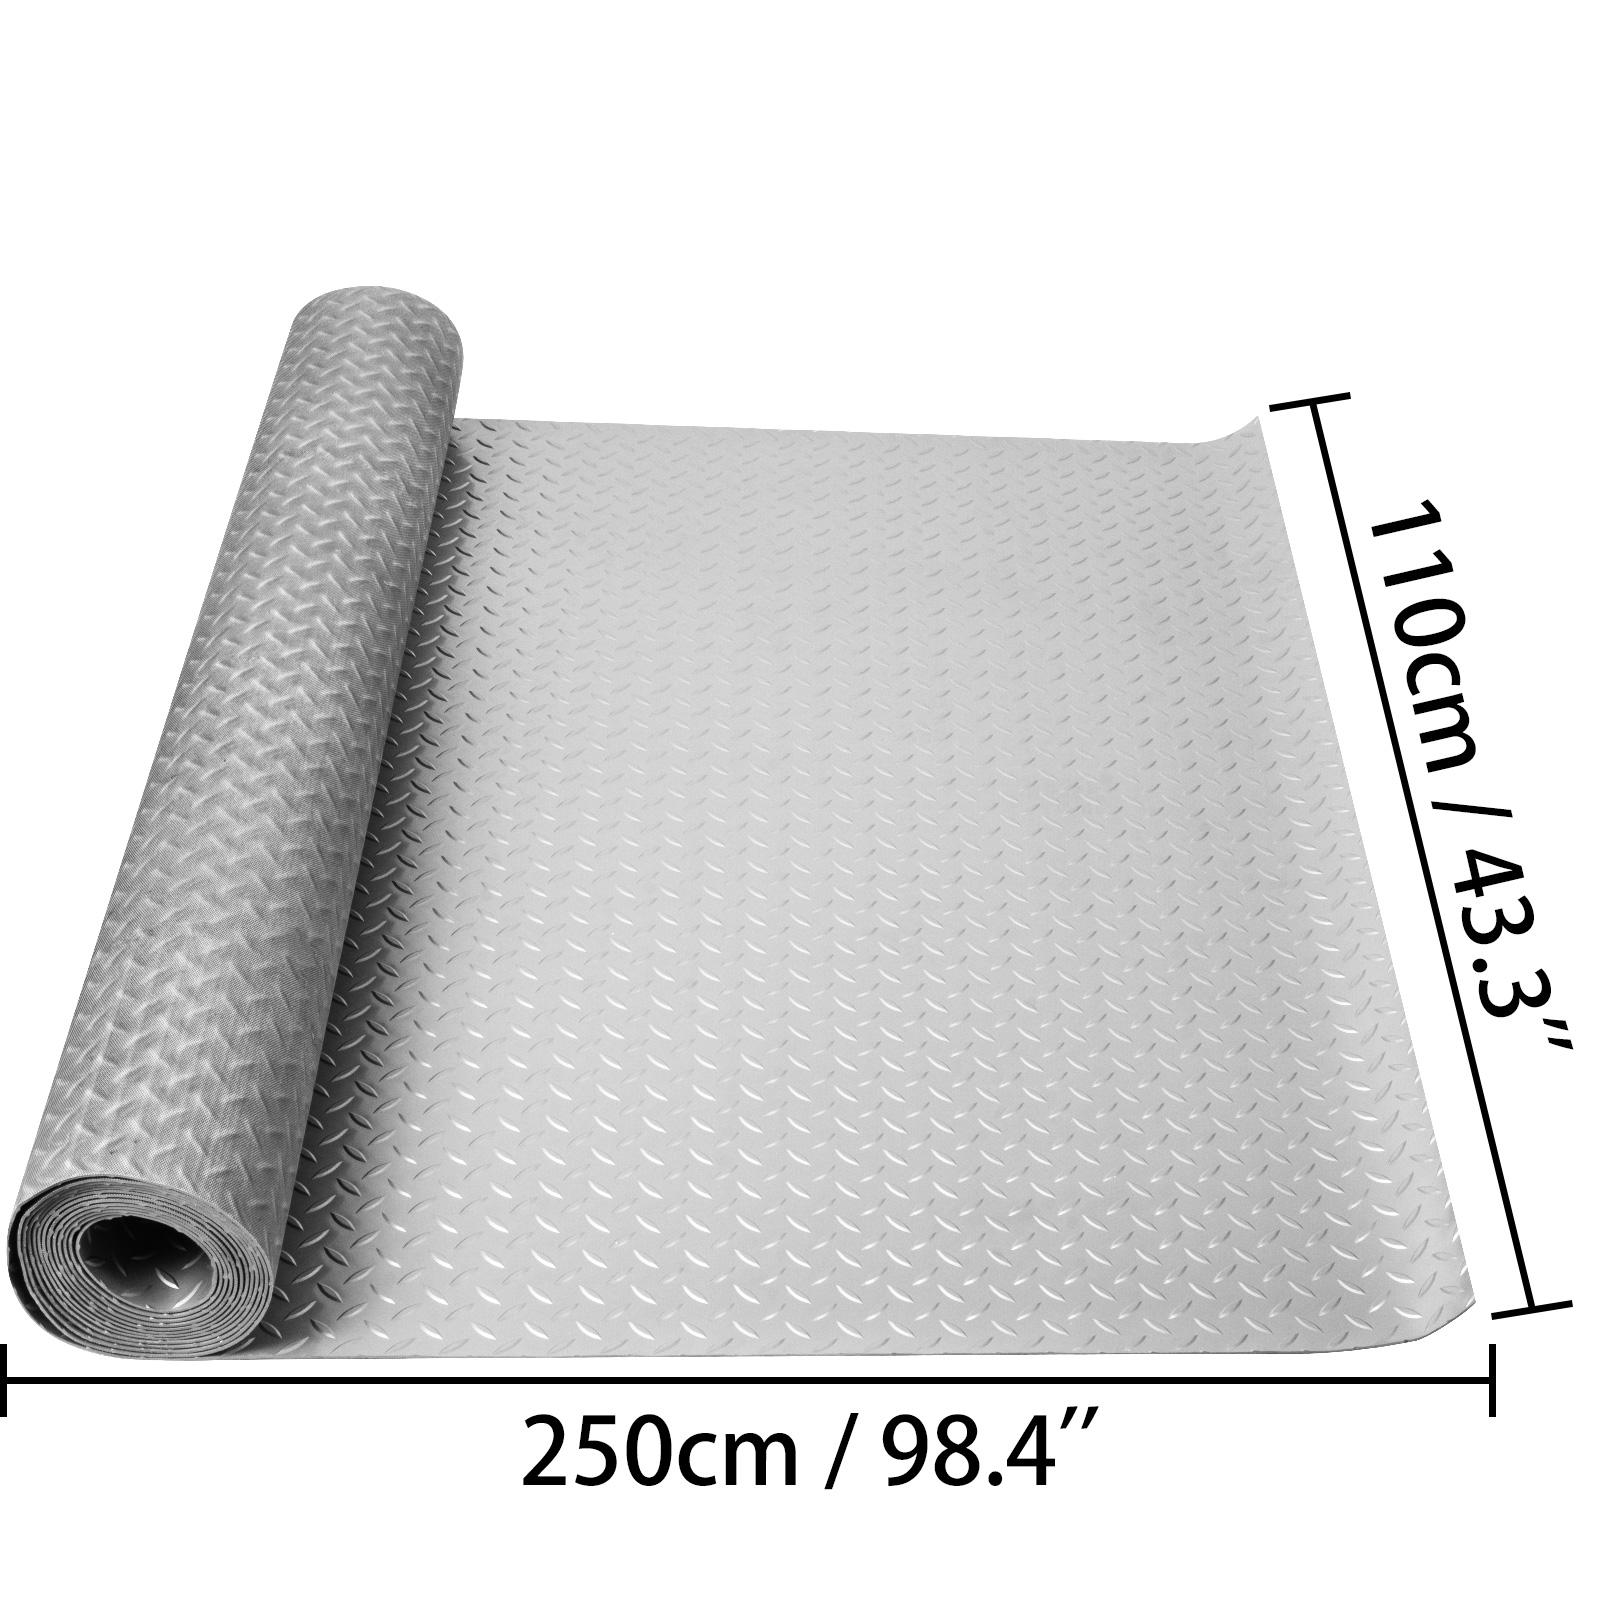 thumbnail 20 - Garage Flooring Mat Roll Car Trailer Floor Covering 1.1m Width Gym Floor Roll